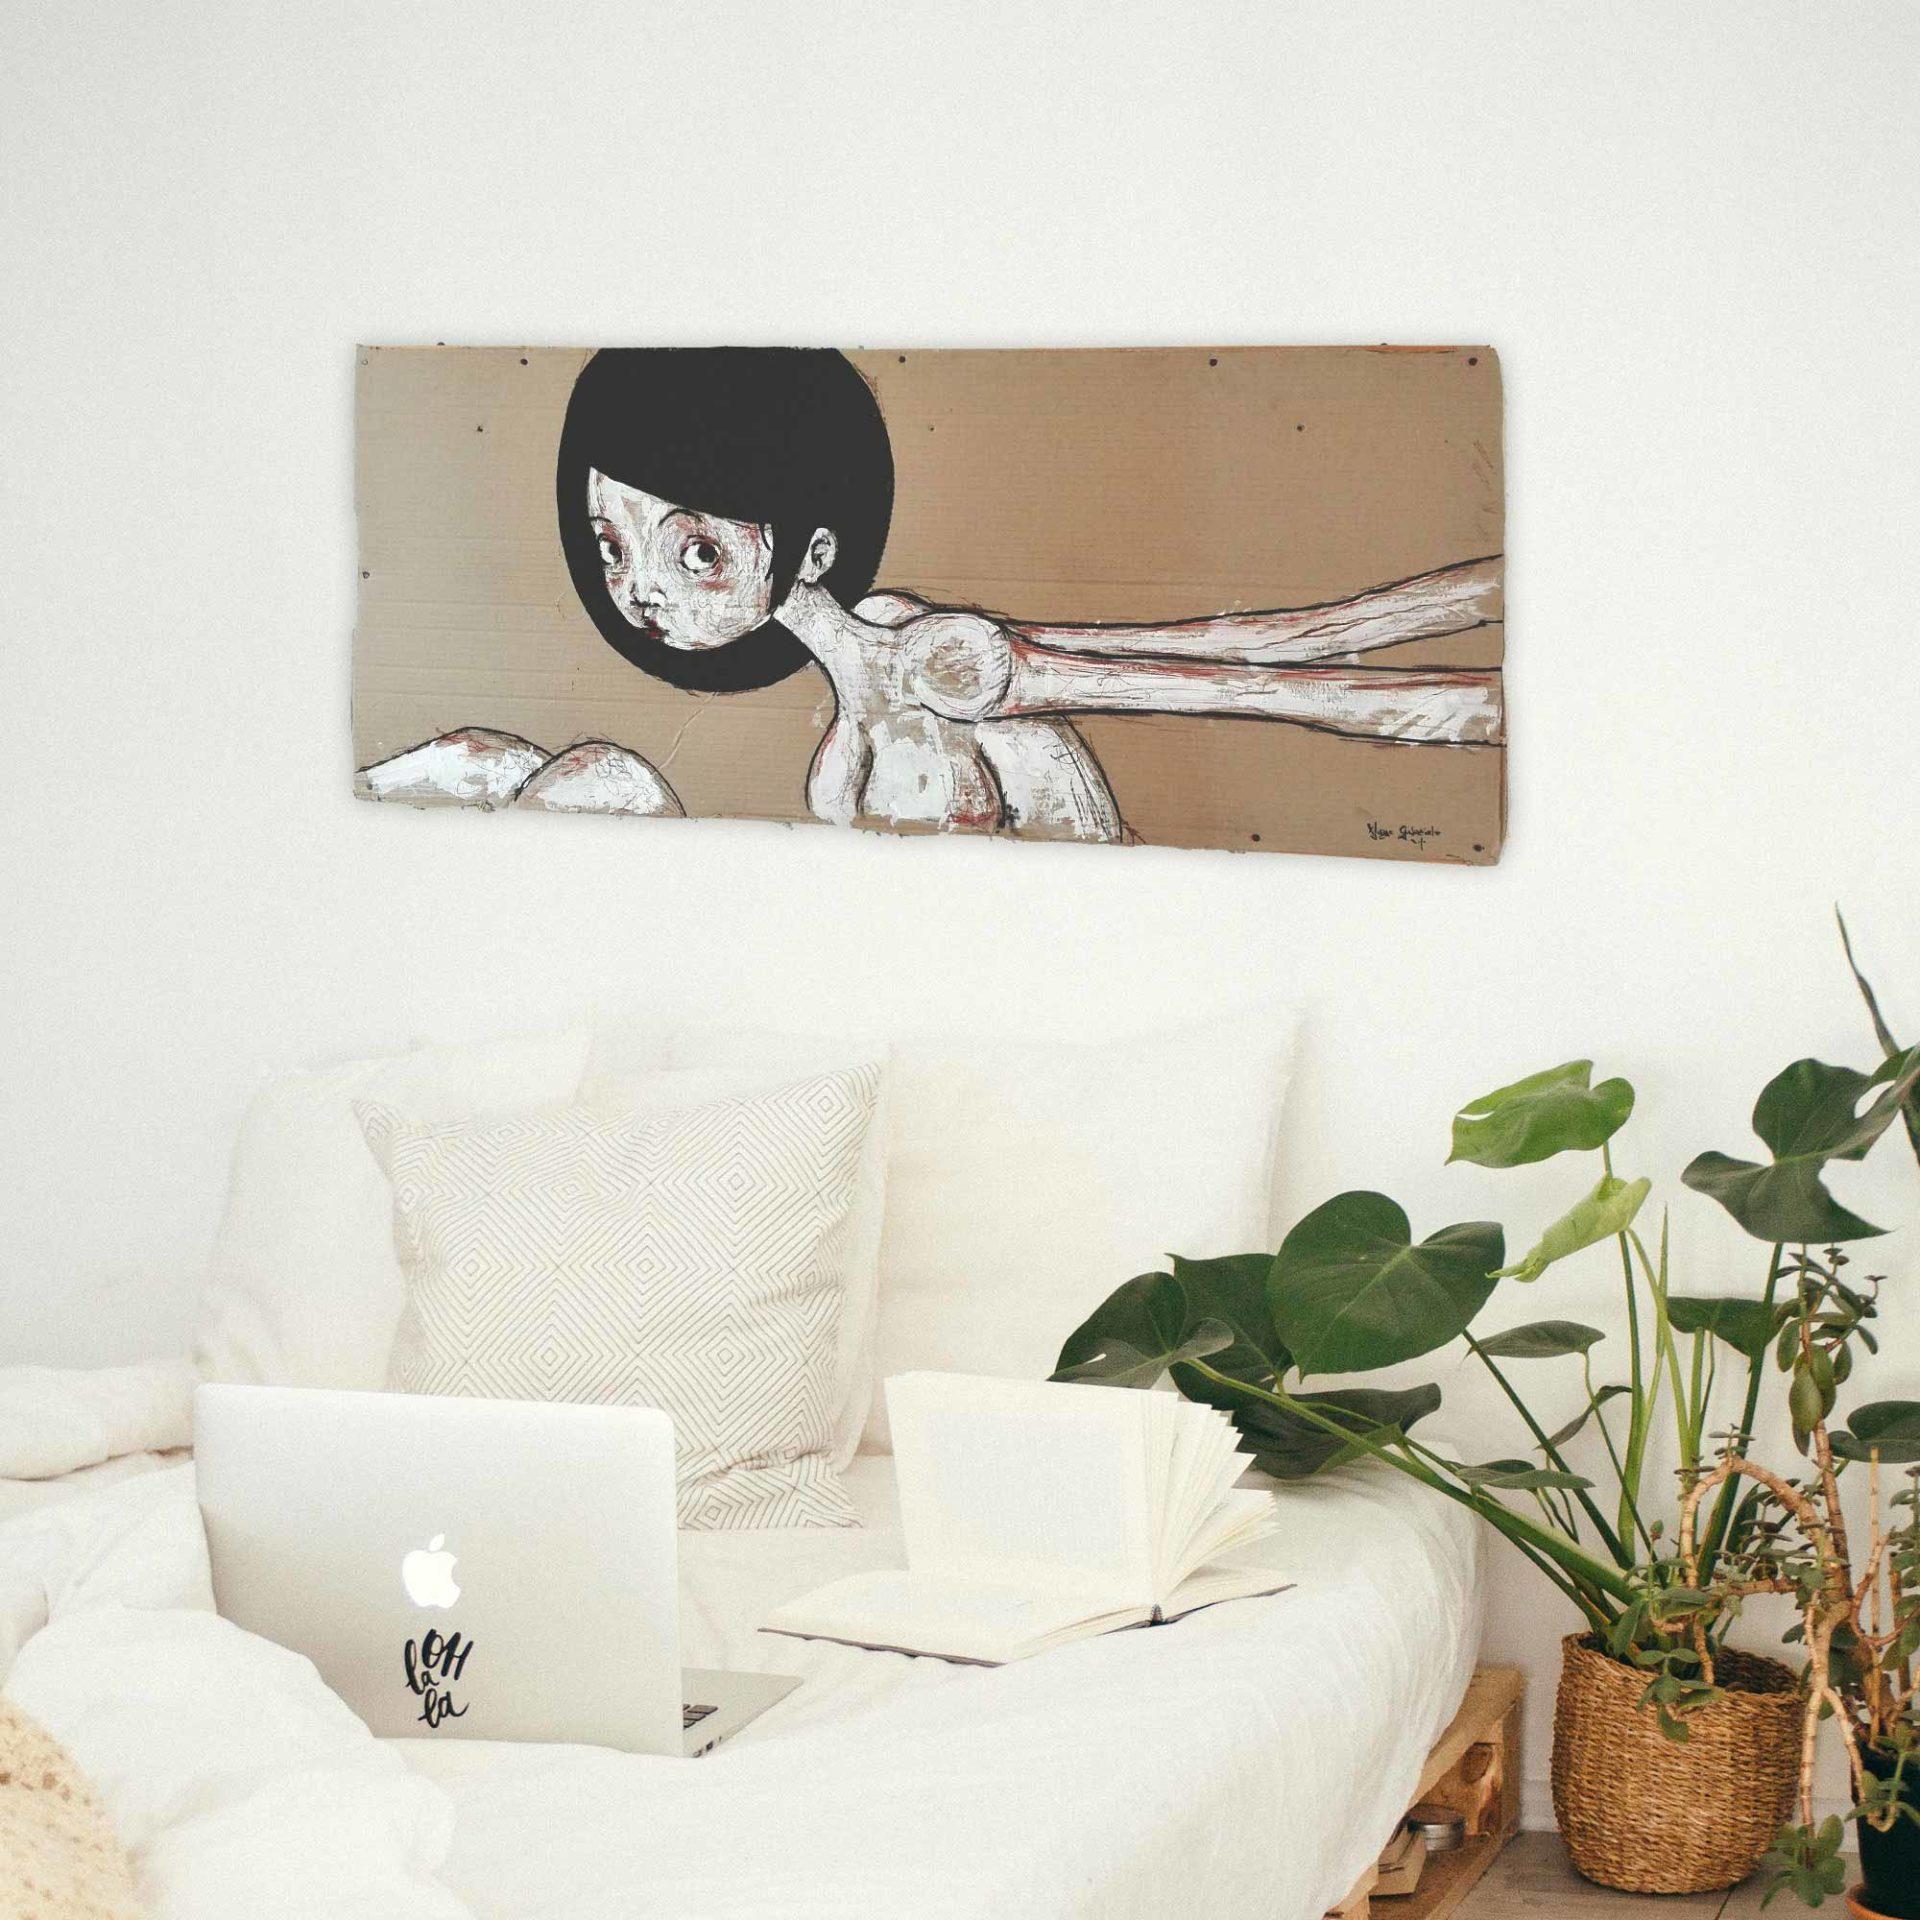 lowbrow art Ma sono nude Legata di Diego Gabriele